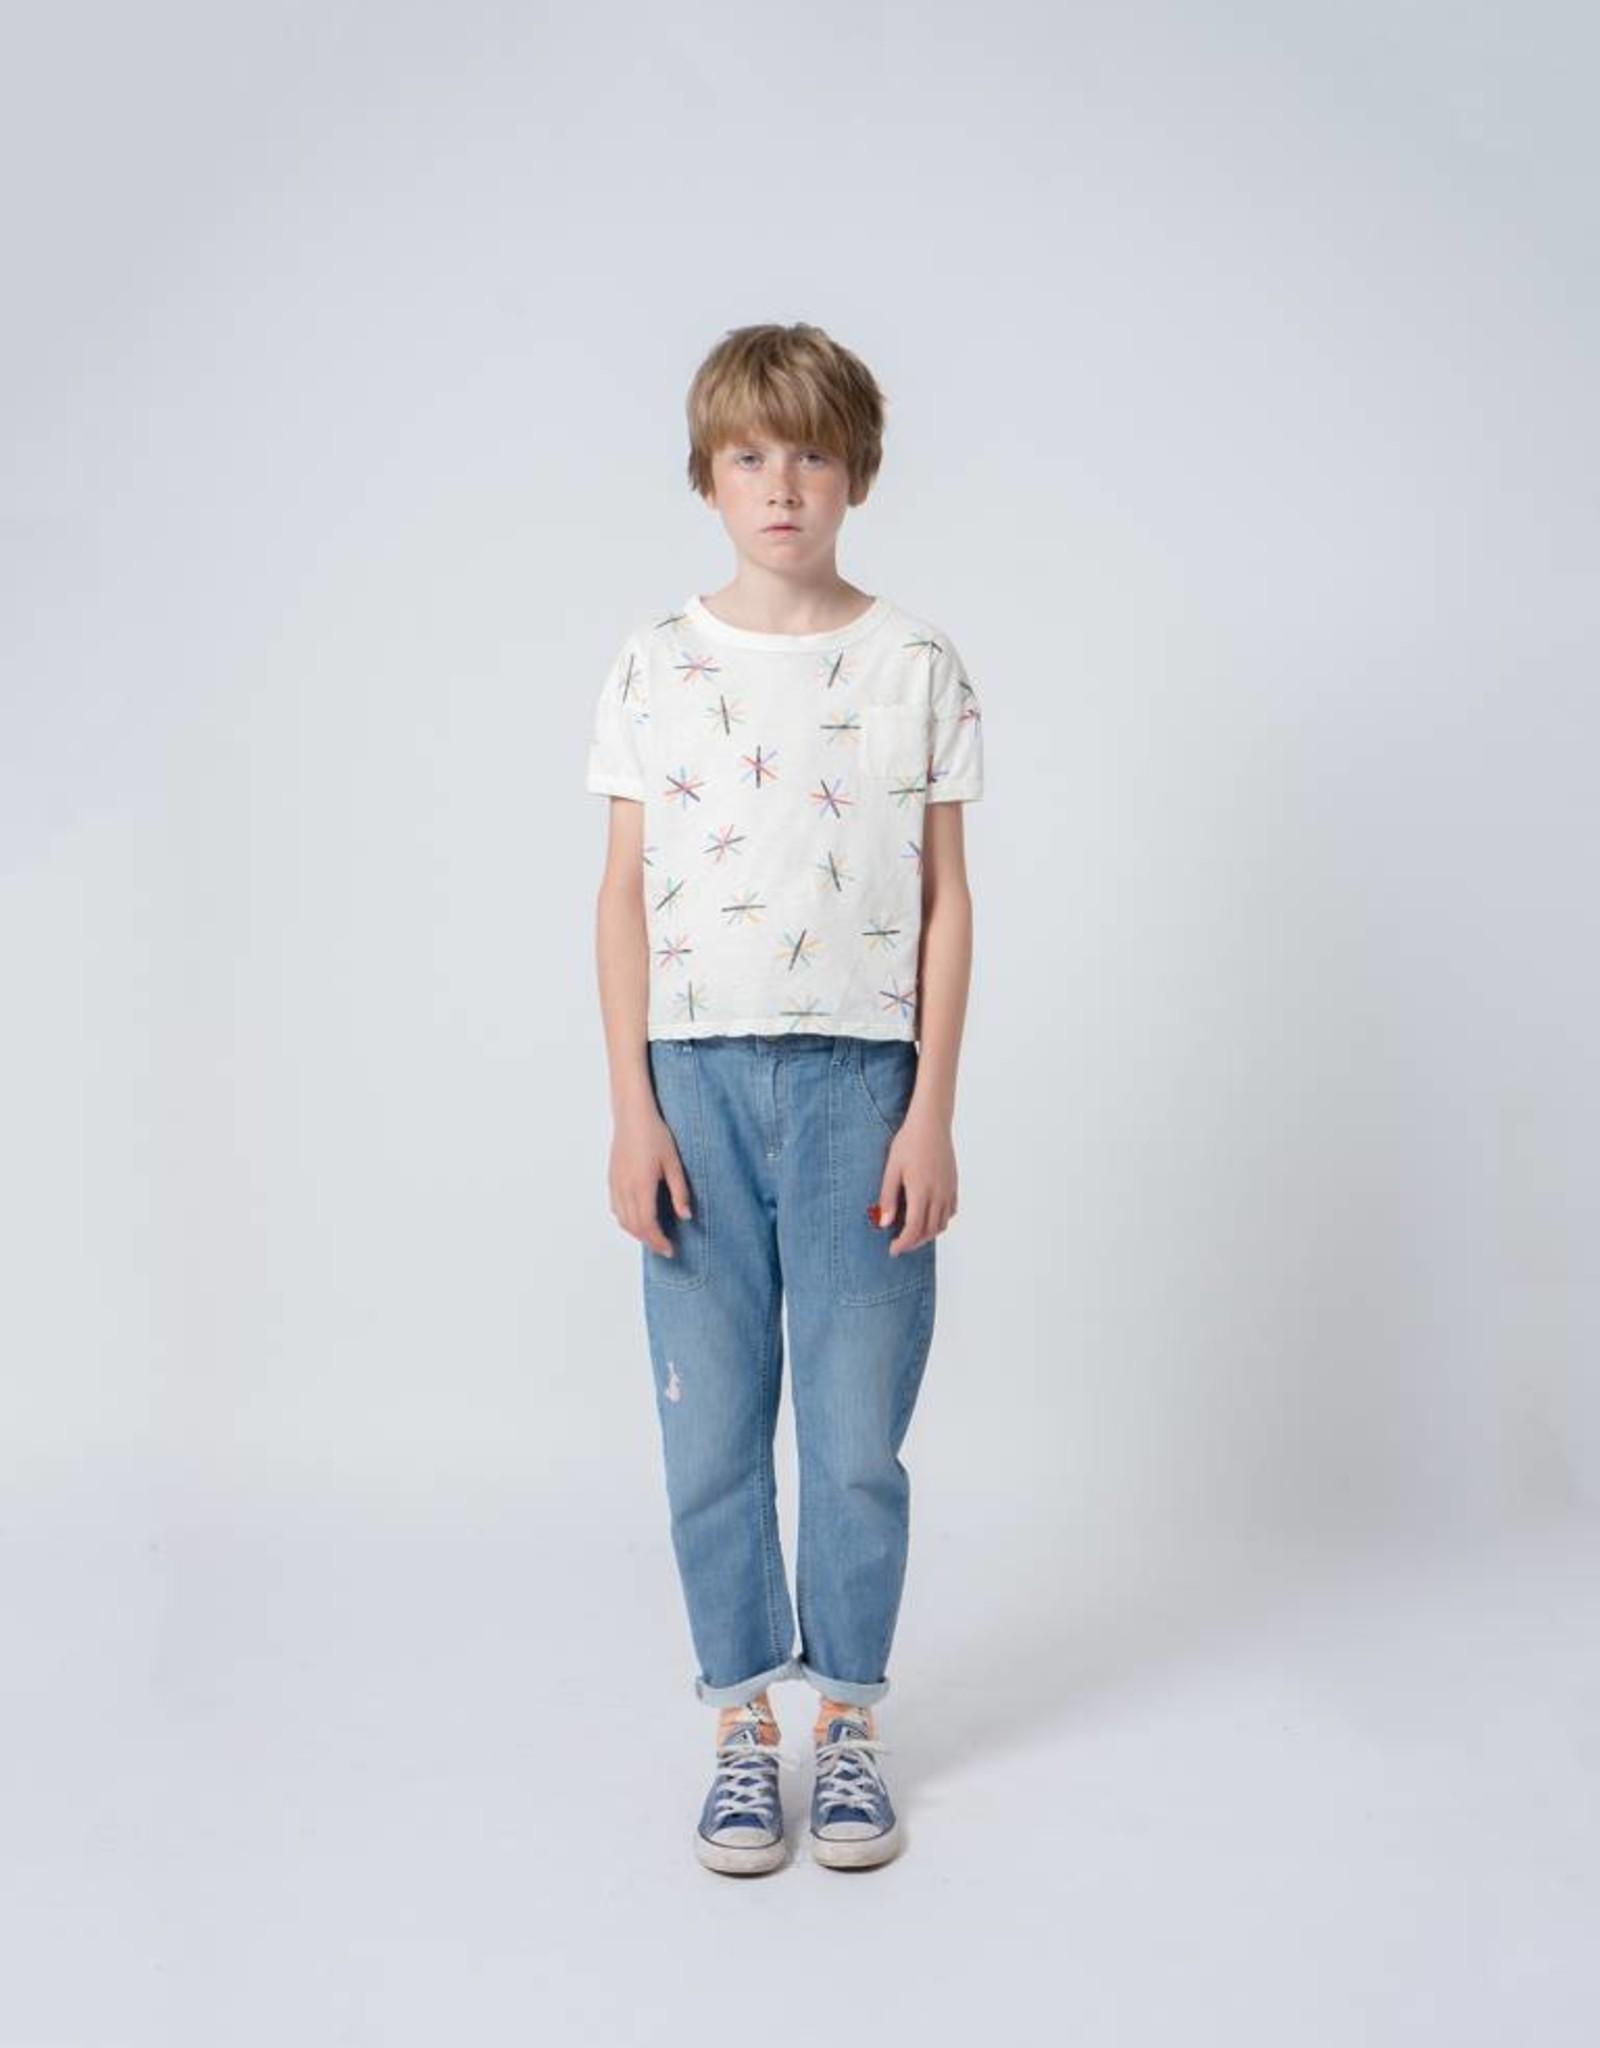 Dandelion T-Shirt